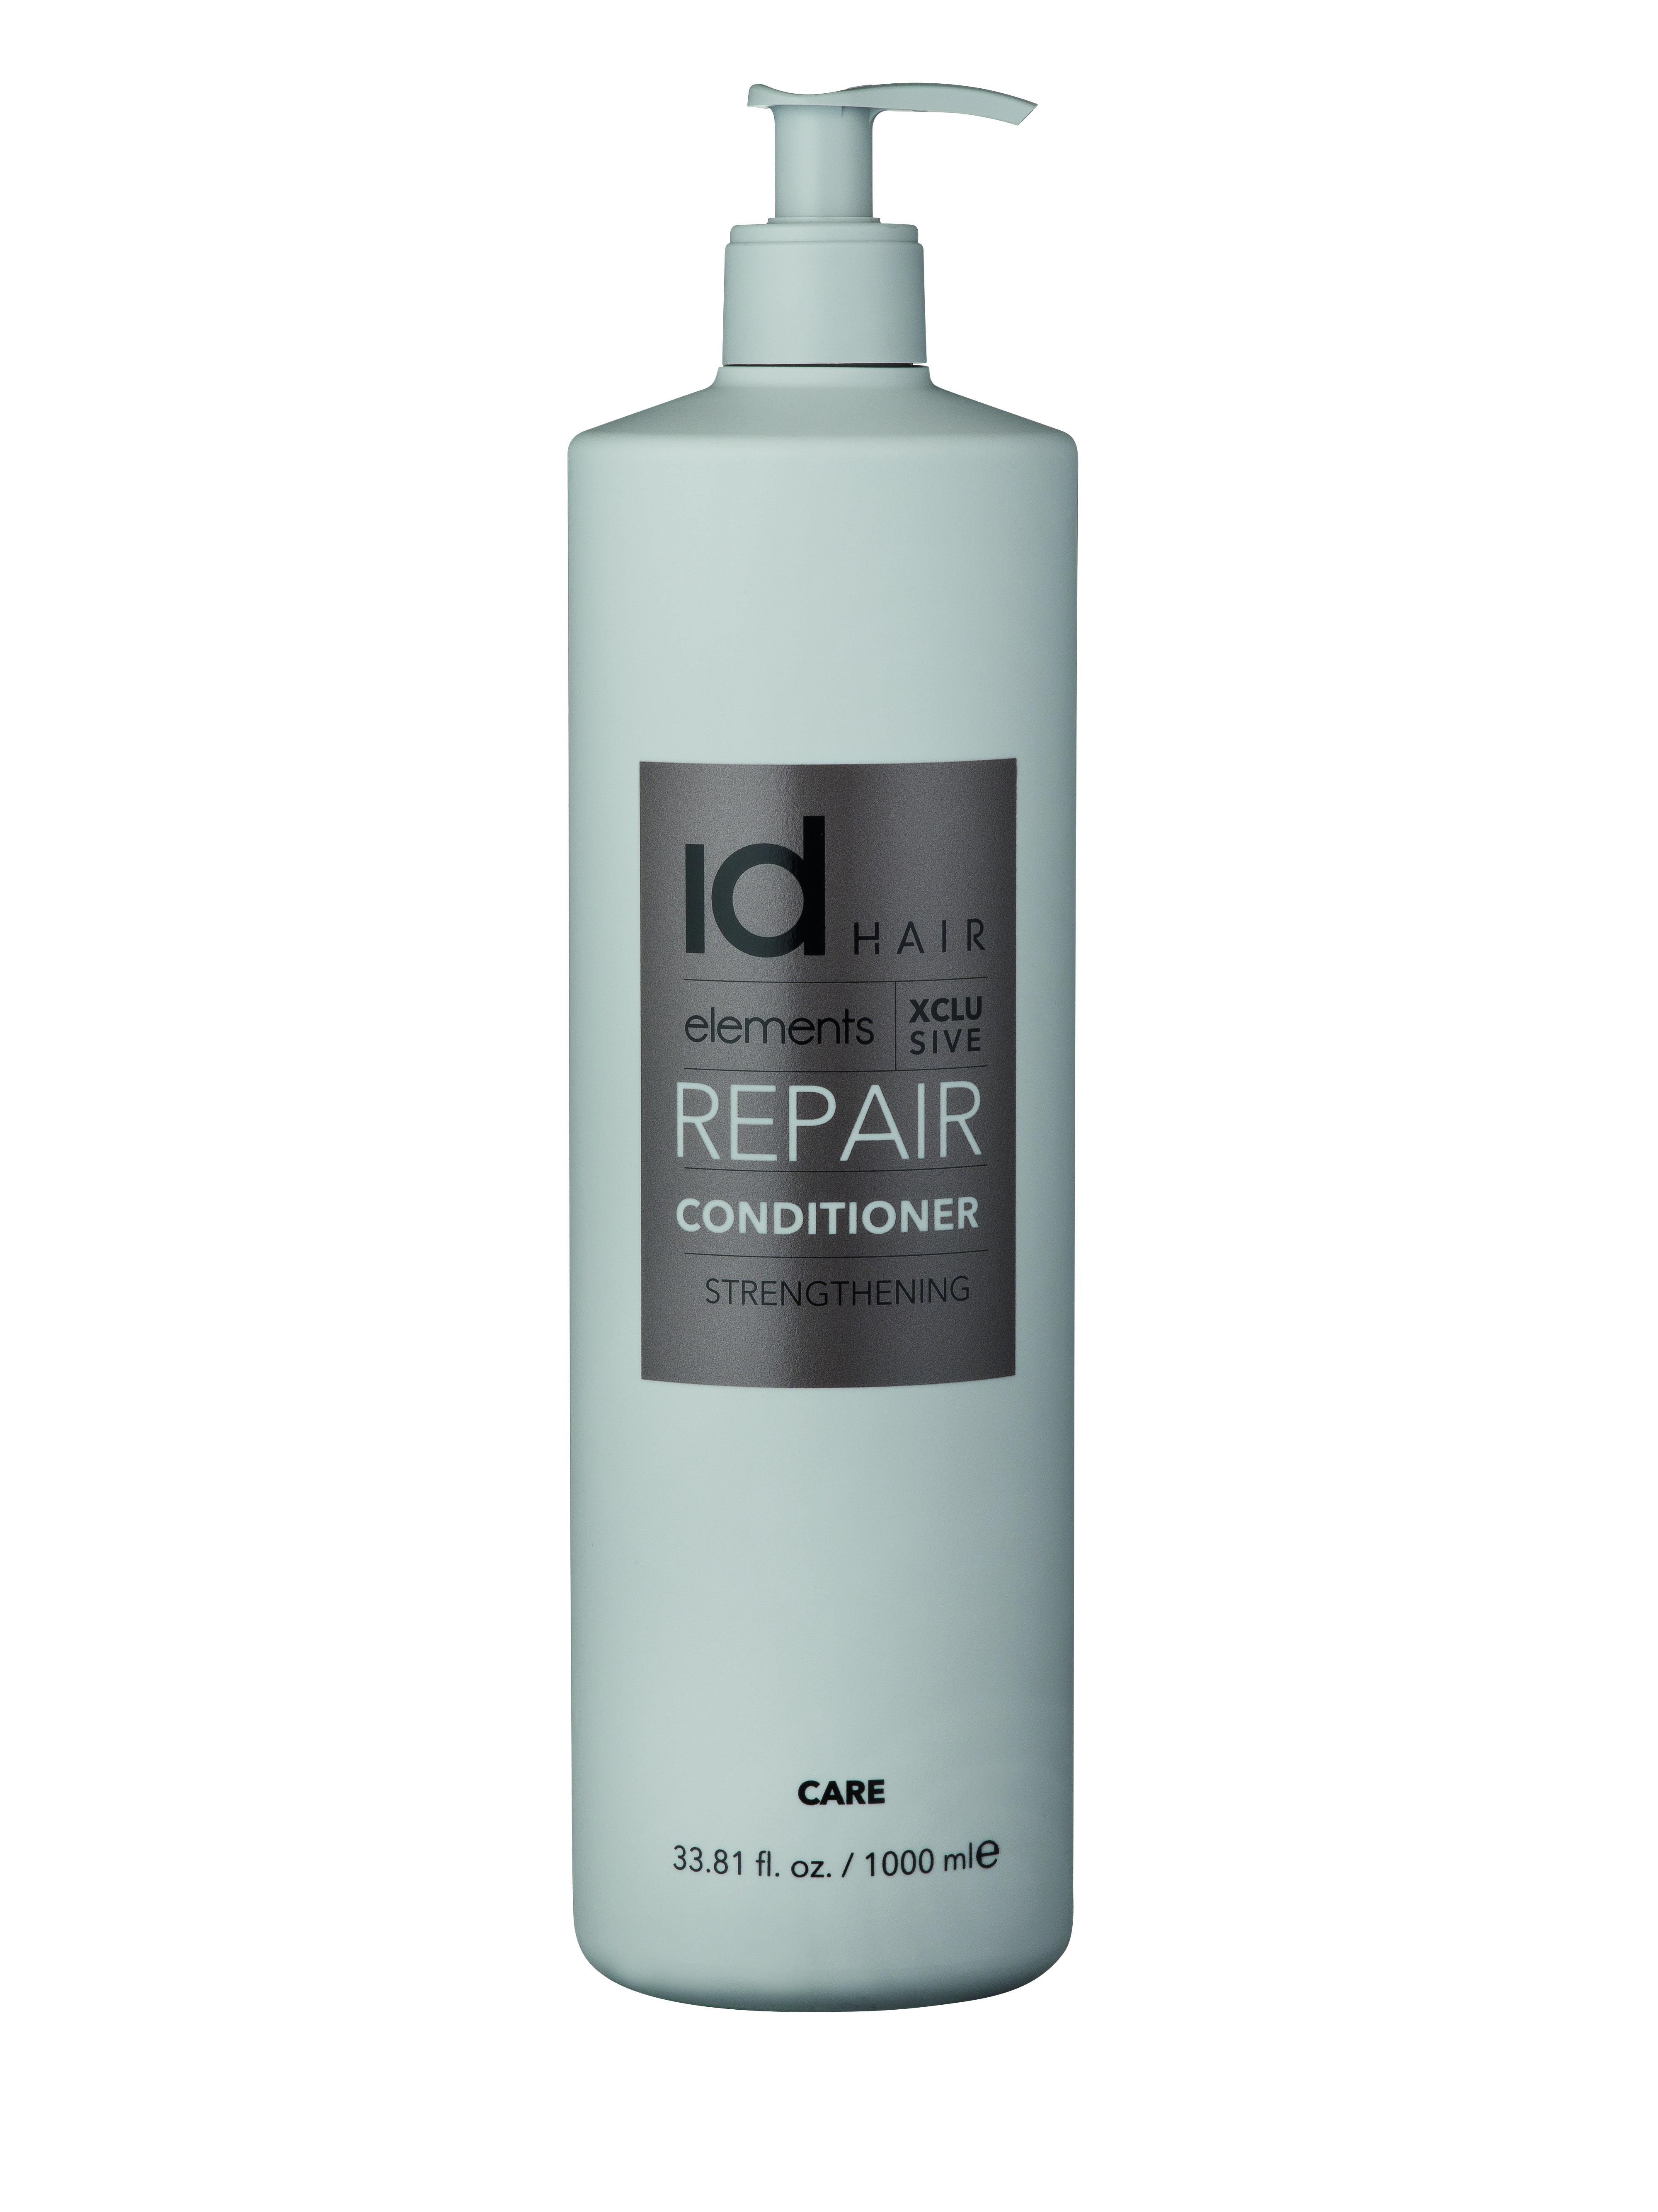 IdHAIR - Elements Xclusive Repair Conditioner 1000 ml